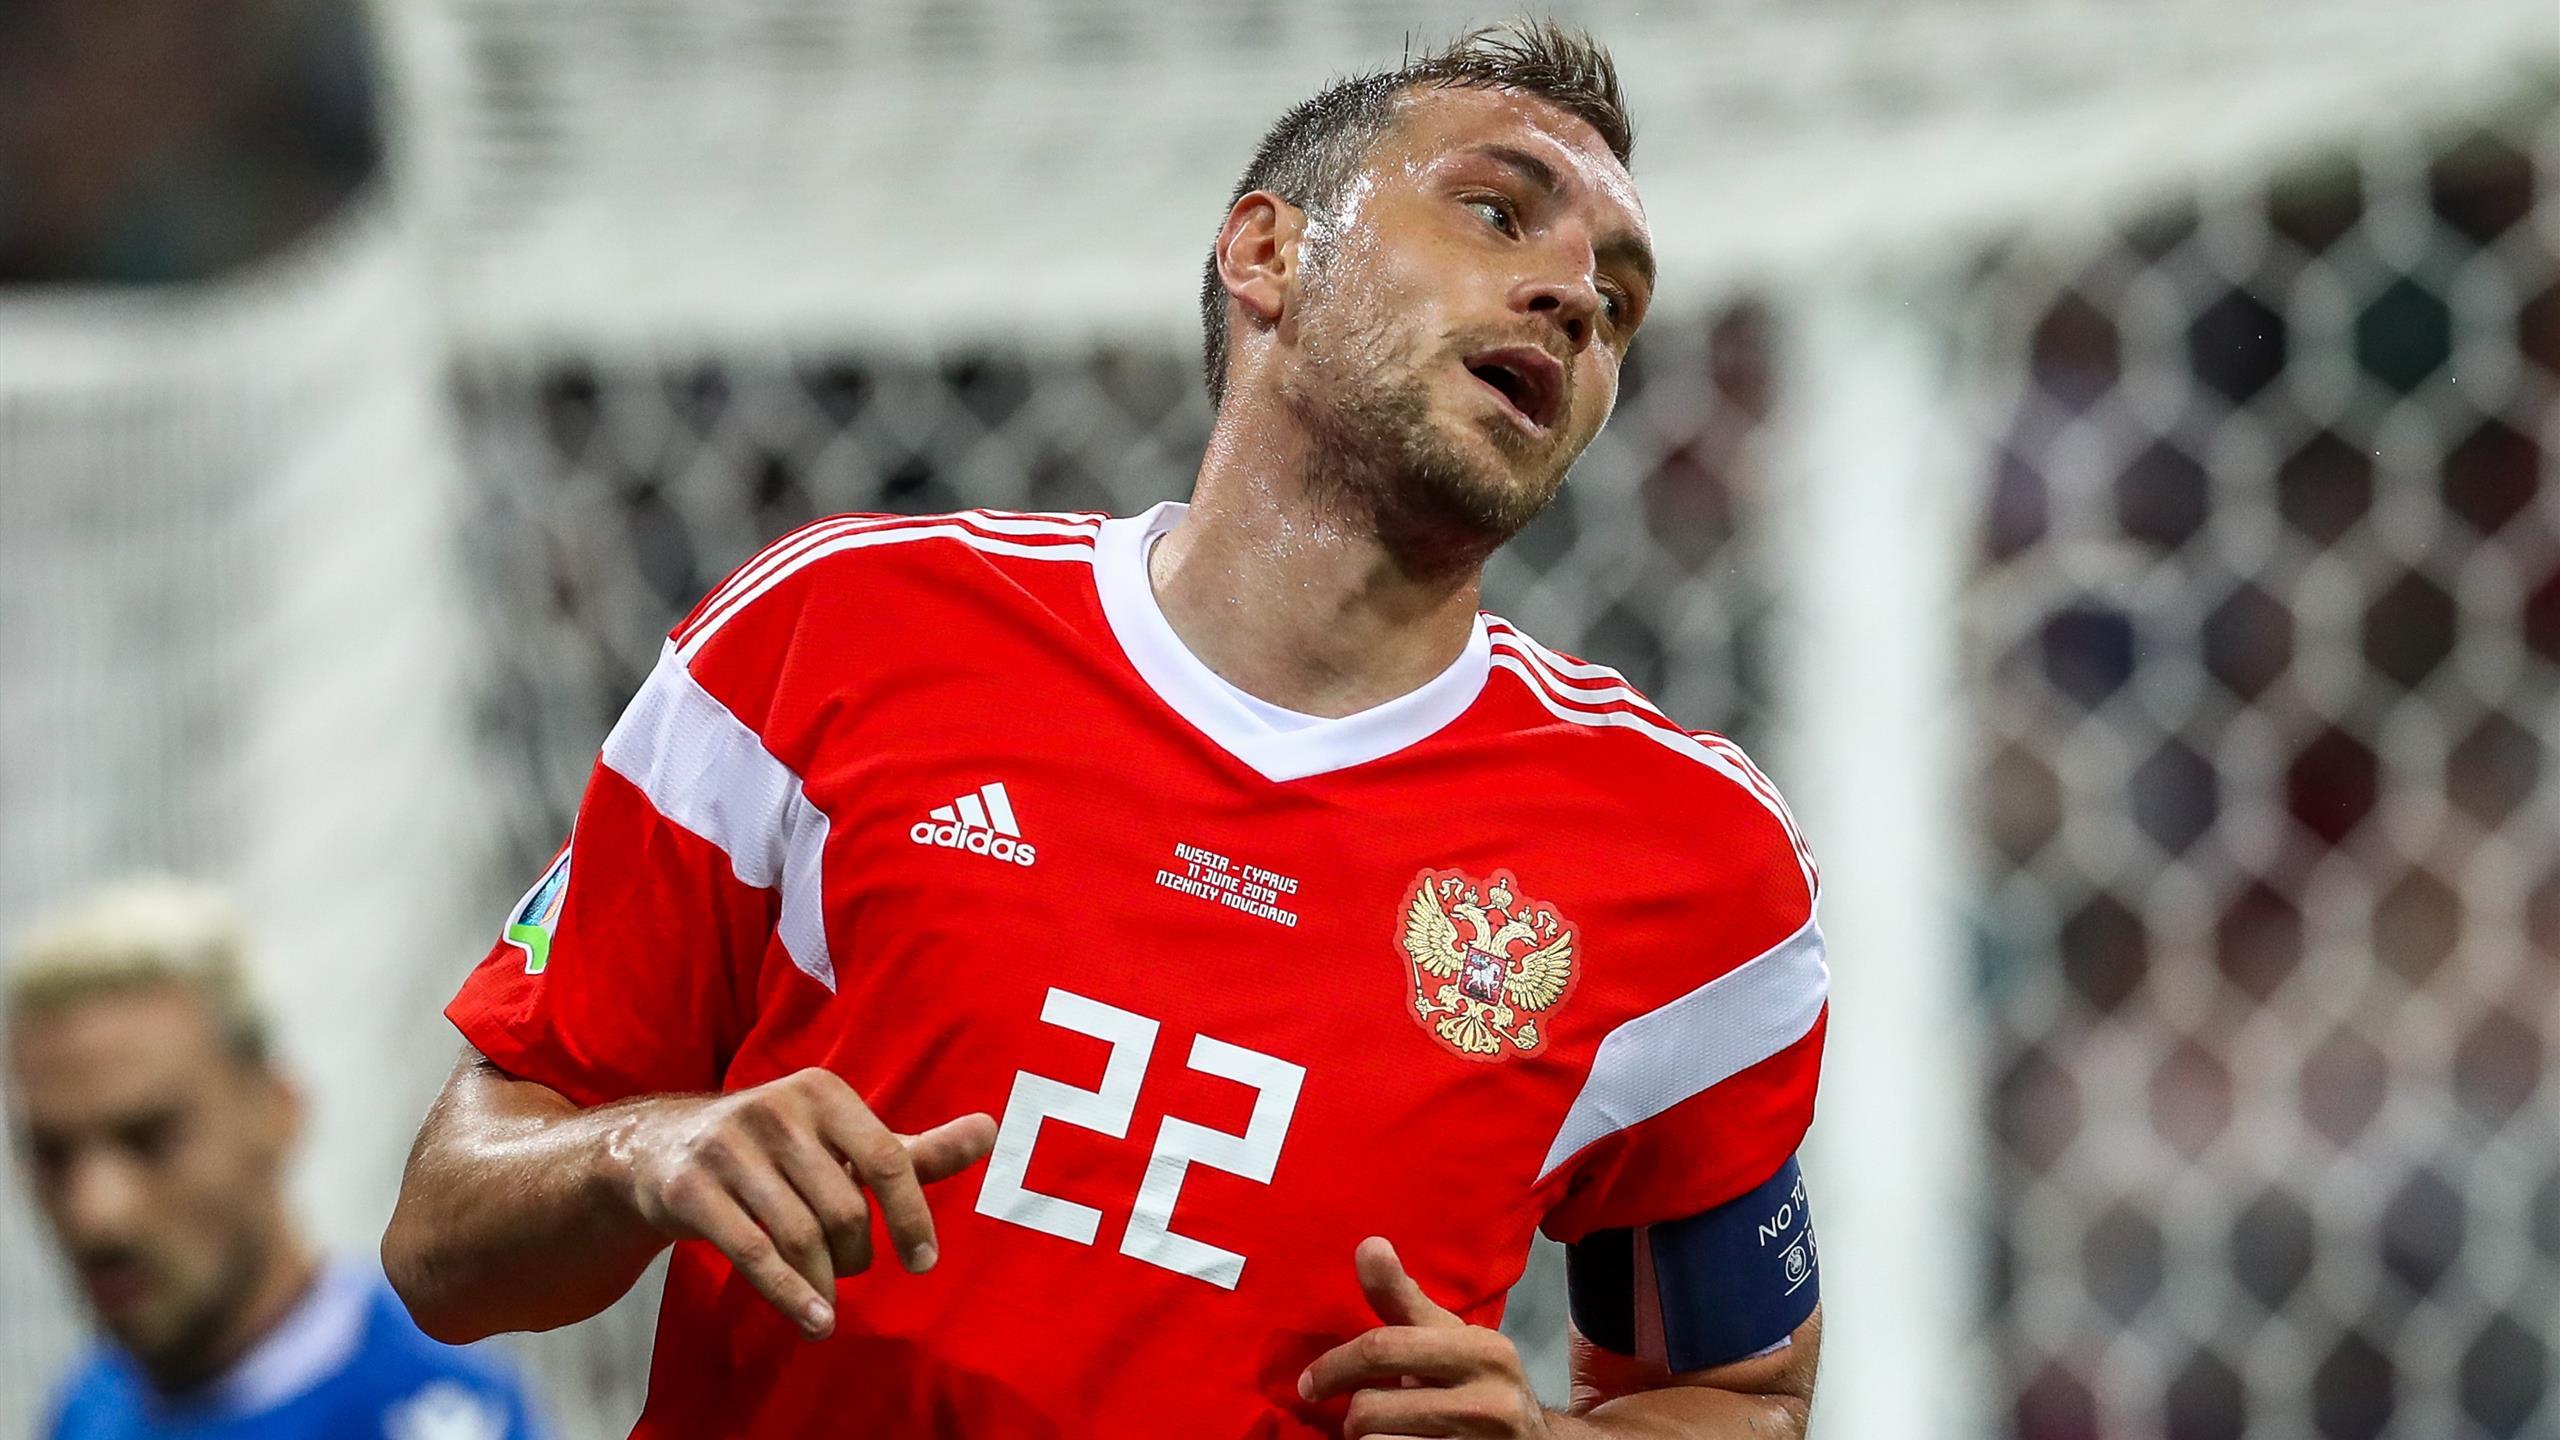 Россия италия футбол 2012 ставки